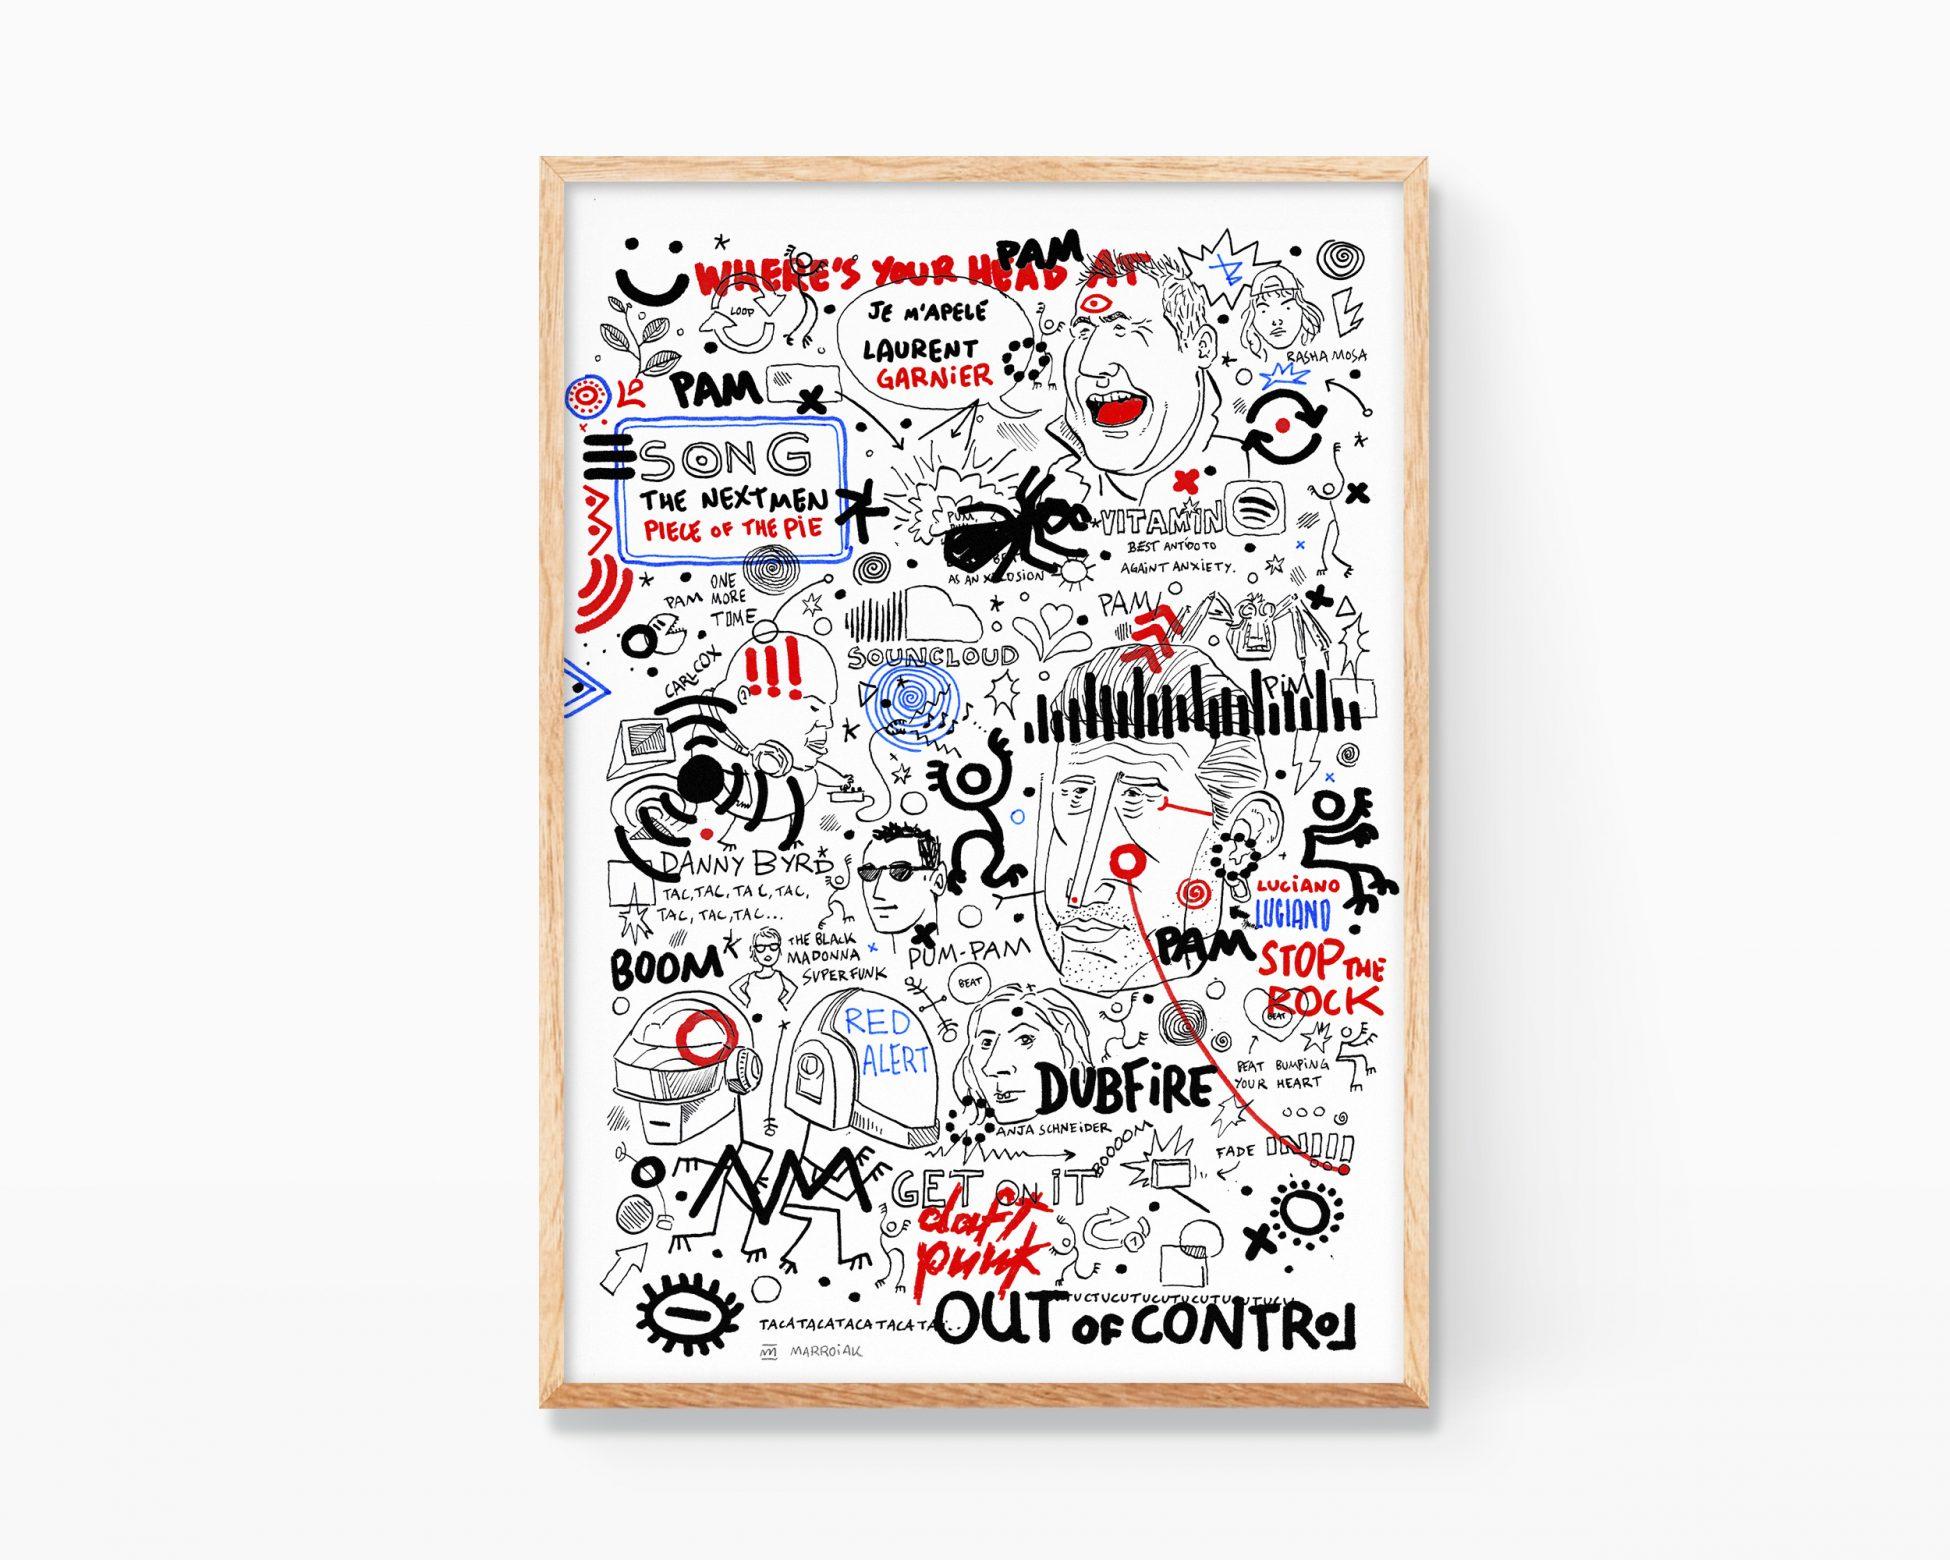 Obra gráfica original para comprar online. Ilustración música electrónica: chemical brothers, daft punk, laurent garnier, etc...